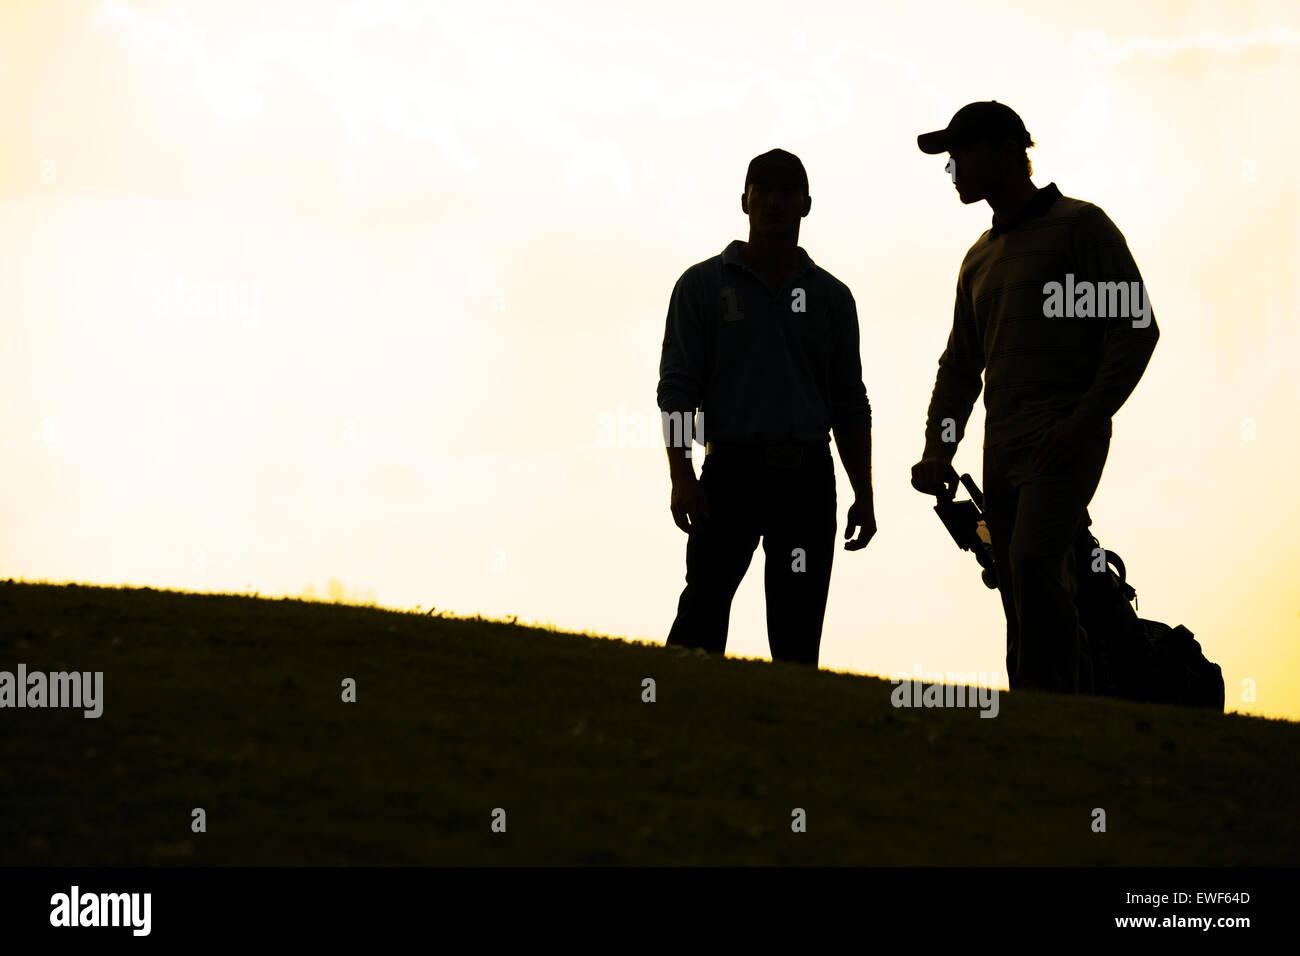 Silueta de jóvenes parados en campo de golf con carrito Imagen De Stock